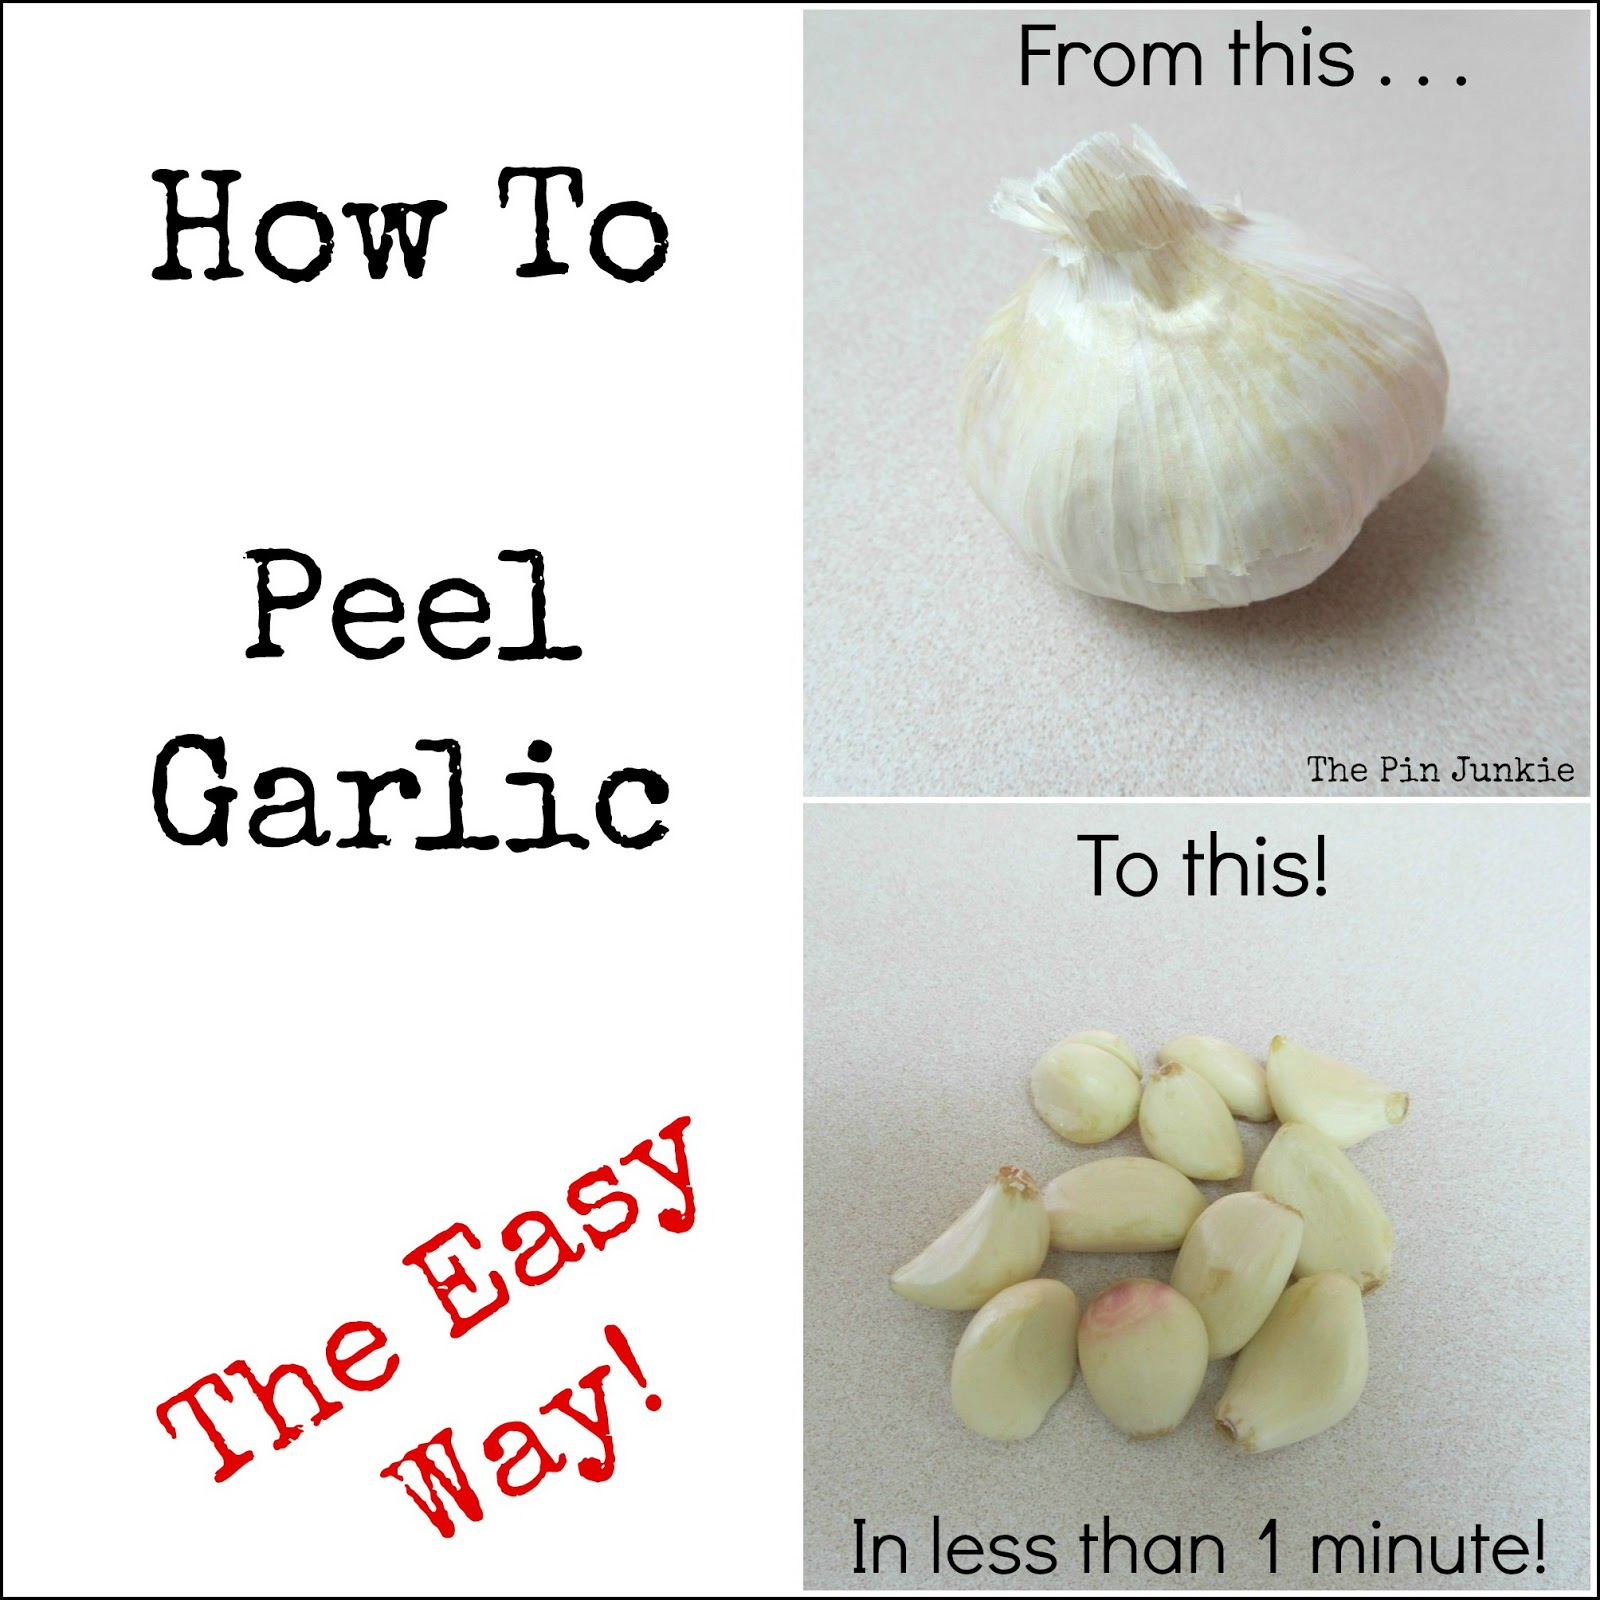 How To Peel Garlic The Easy Way